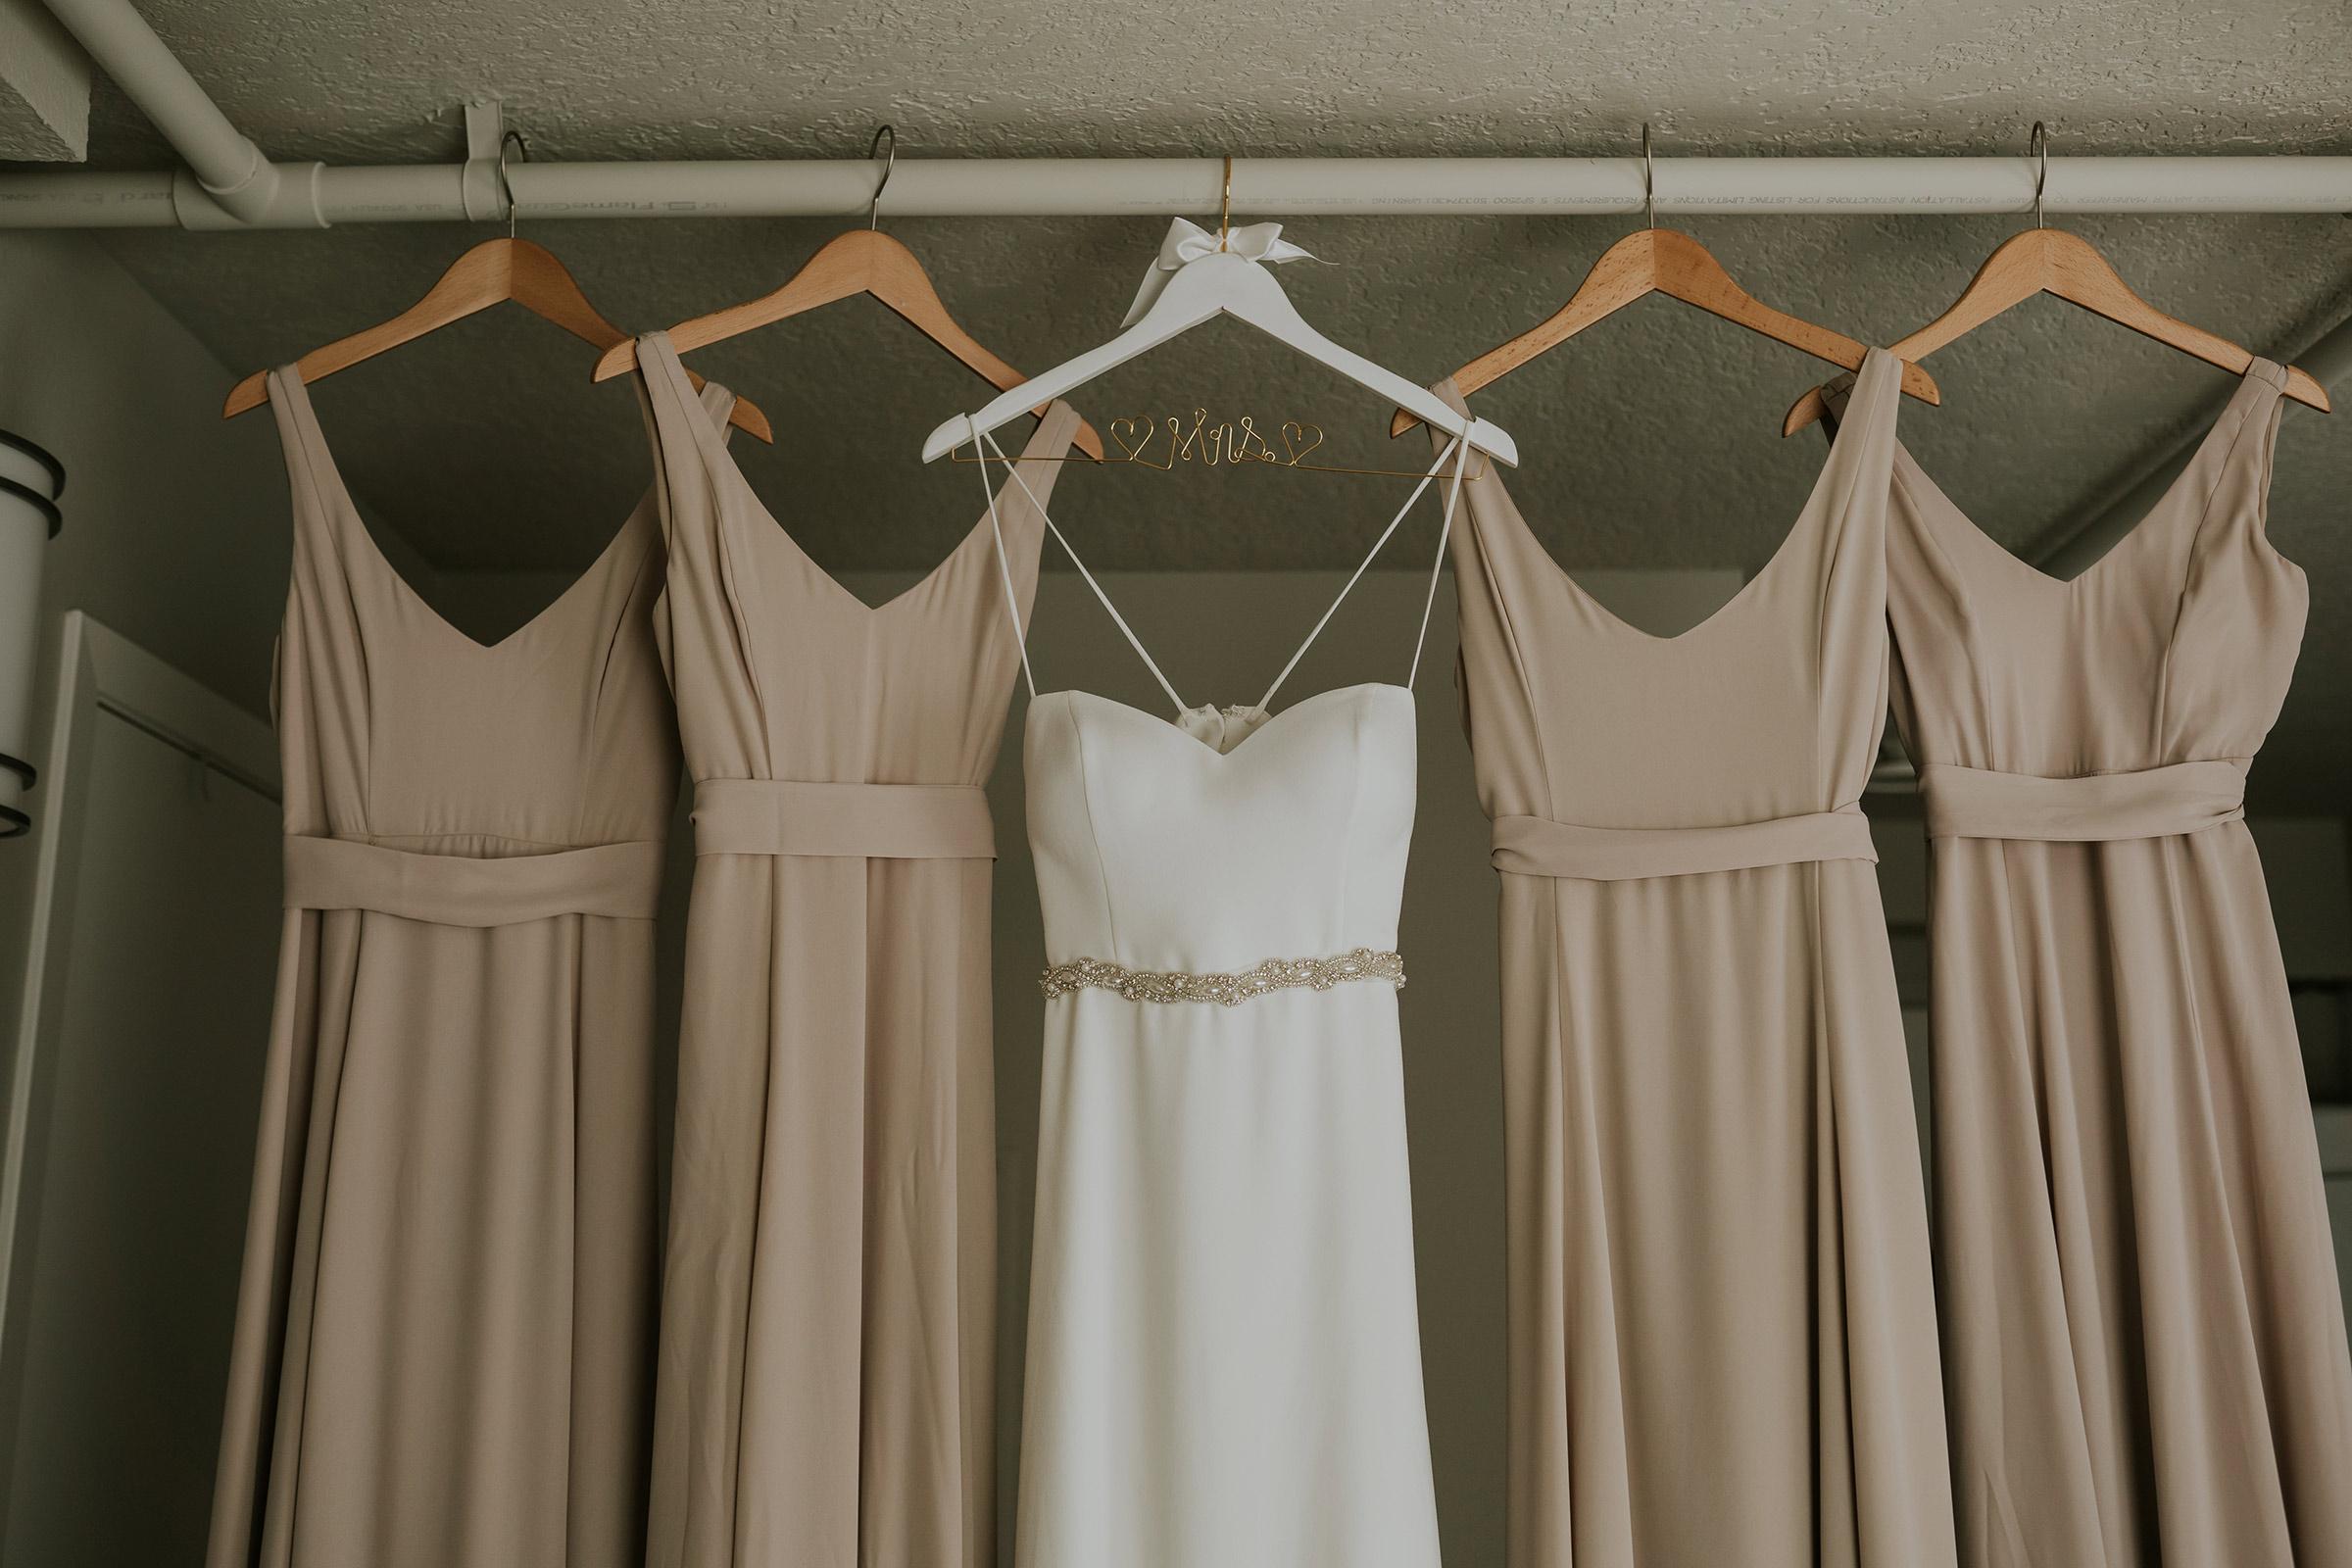 mr-mrs-hull-bride-dress-bridesmaid-dresses-desmoines-iowa-raelyn-ramey-photography-8.jpg